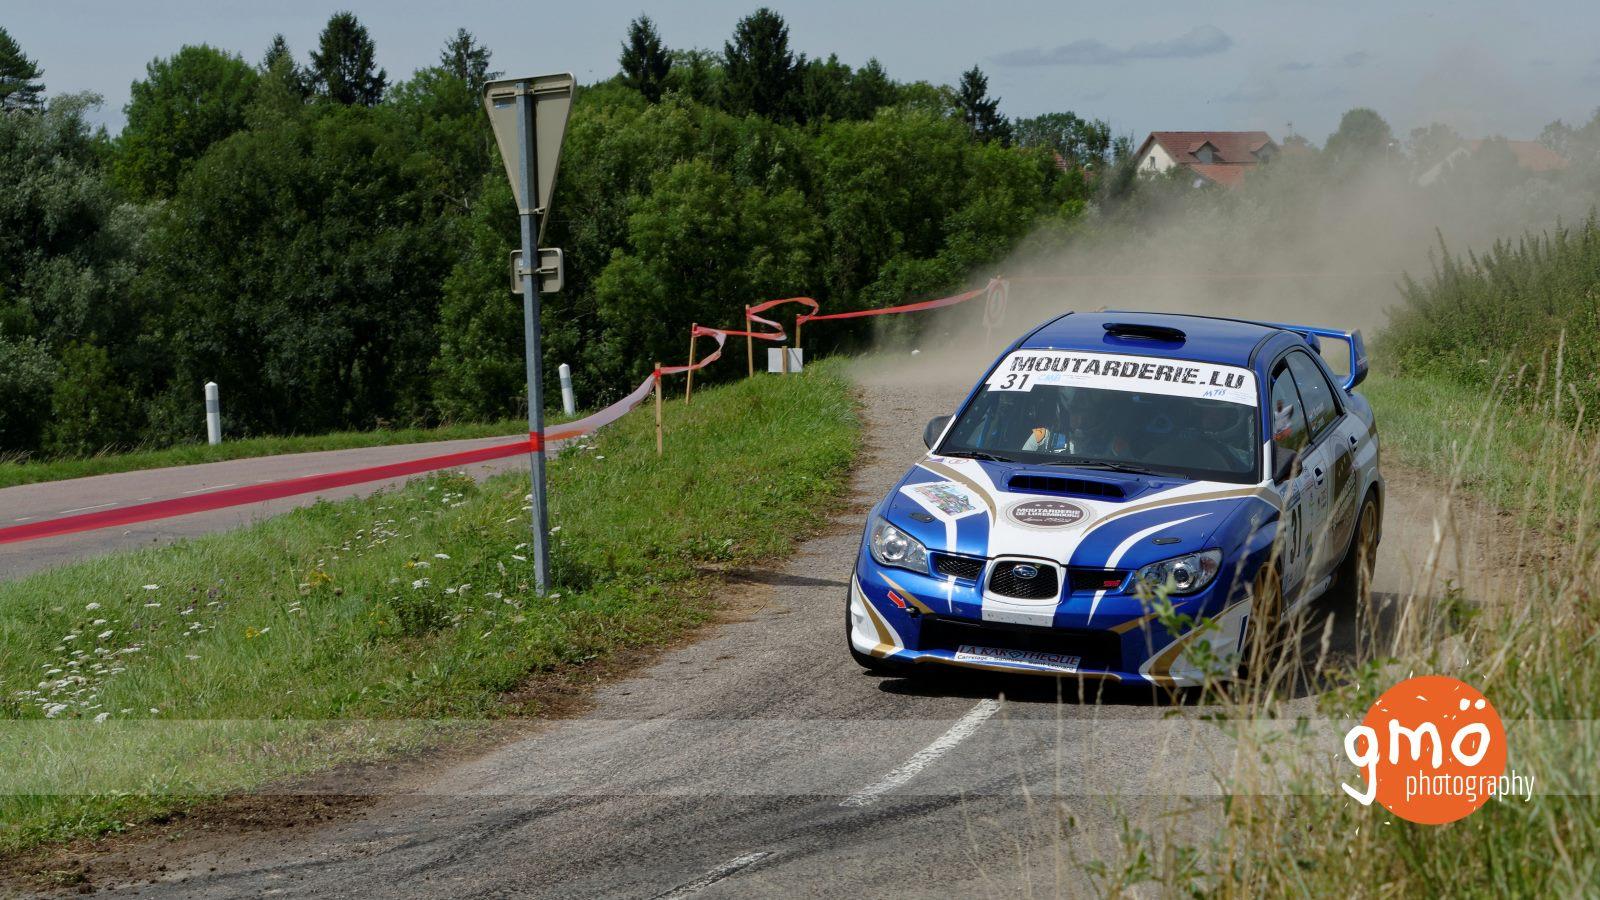 Munhowen Rallye de la Plaine 2017